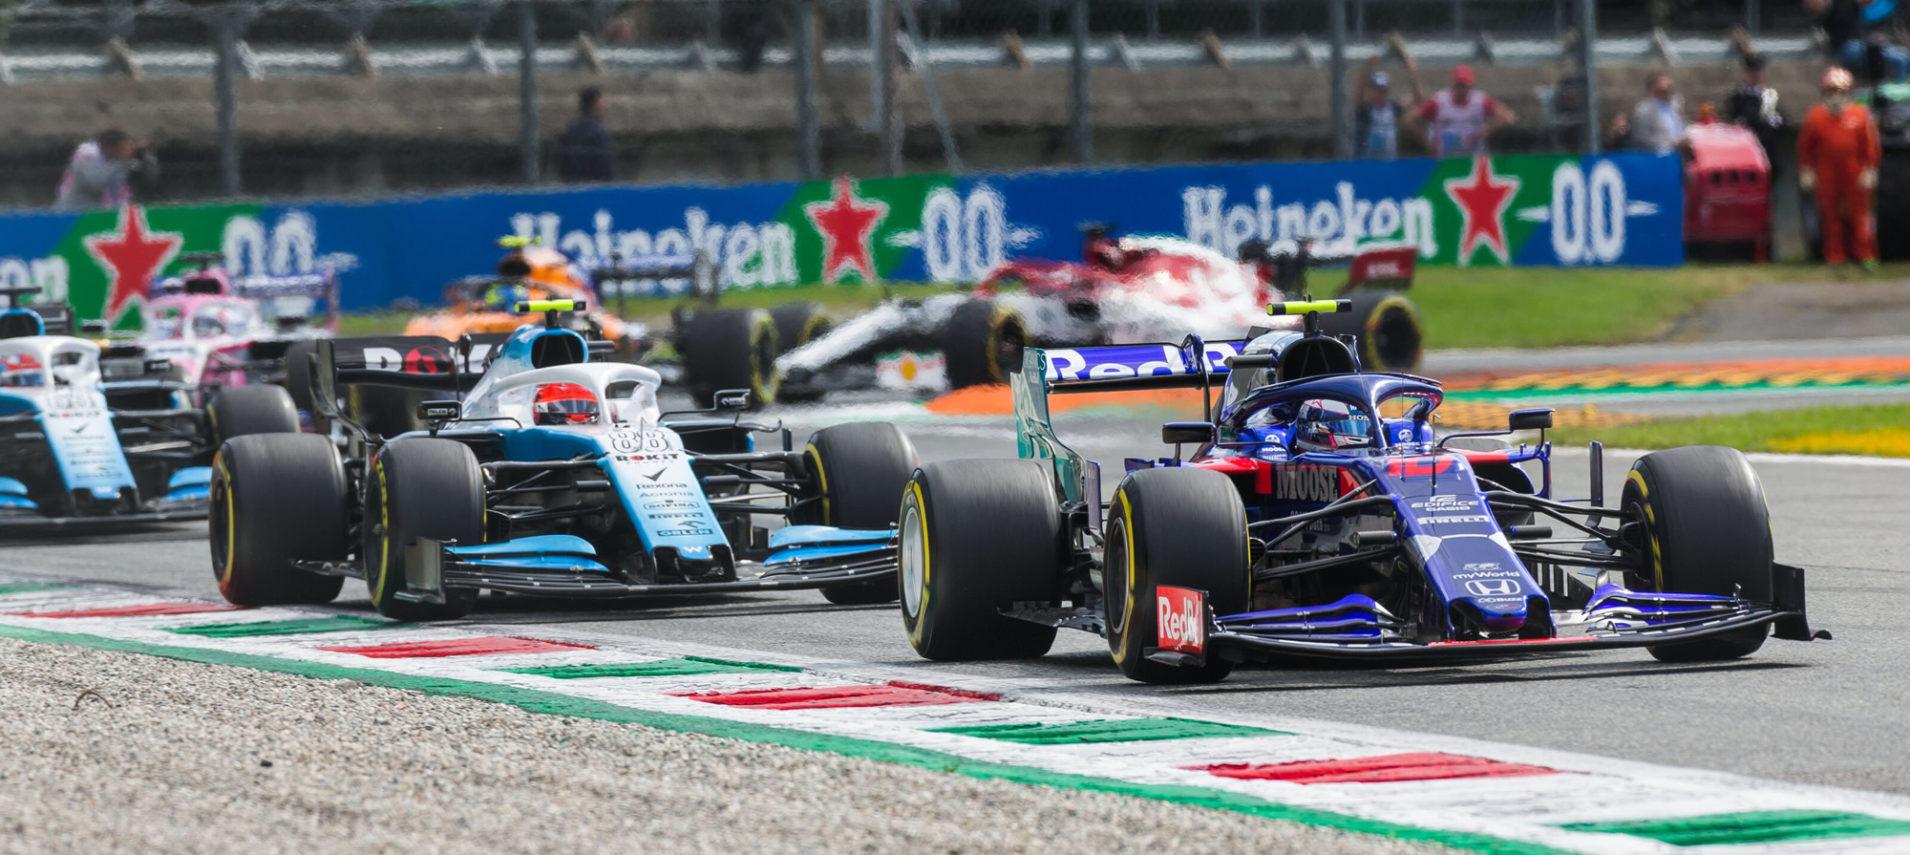 Italian GP 2019 – Gallery 1